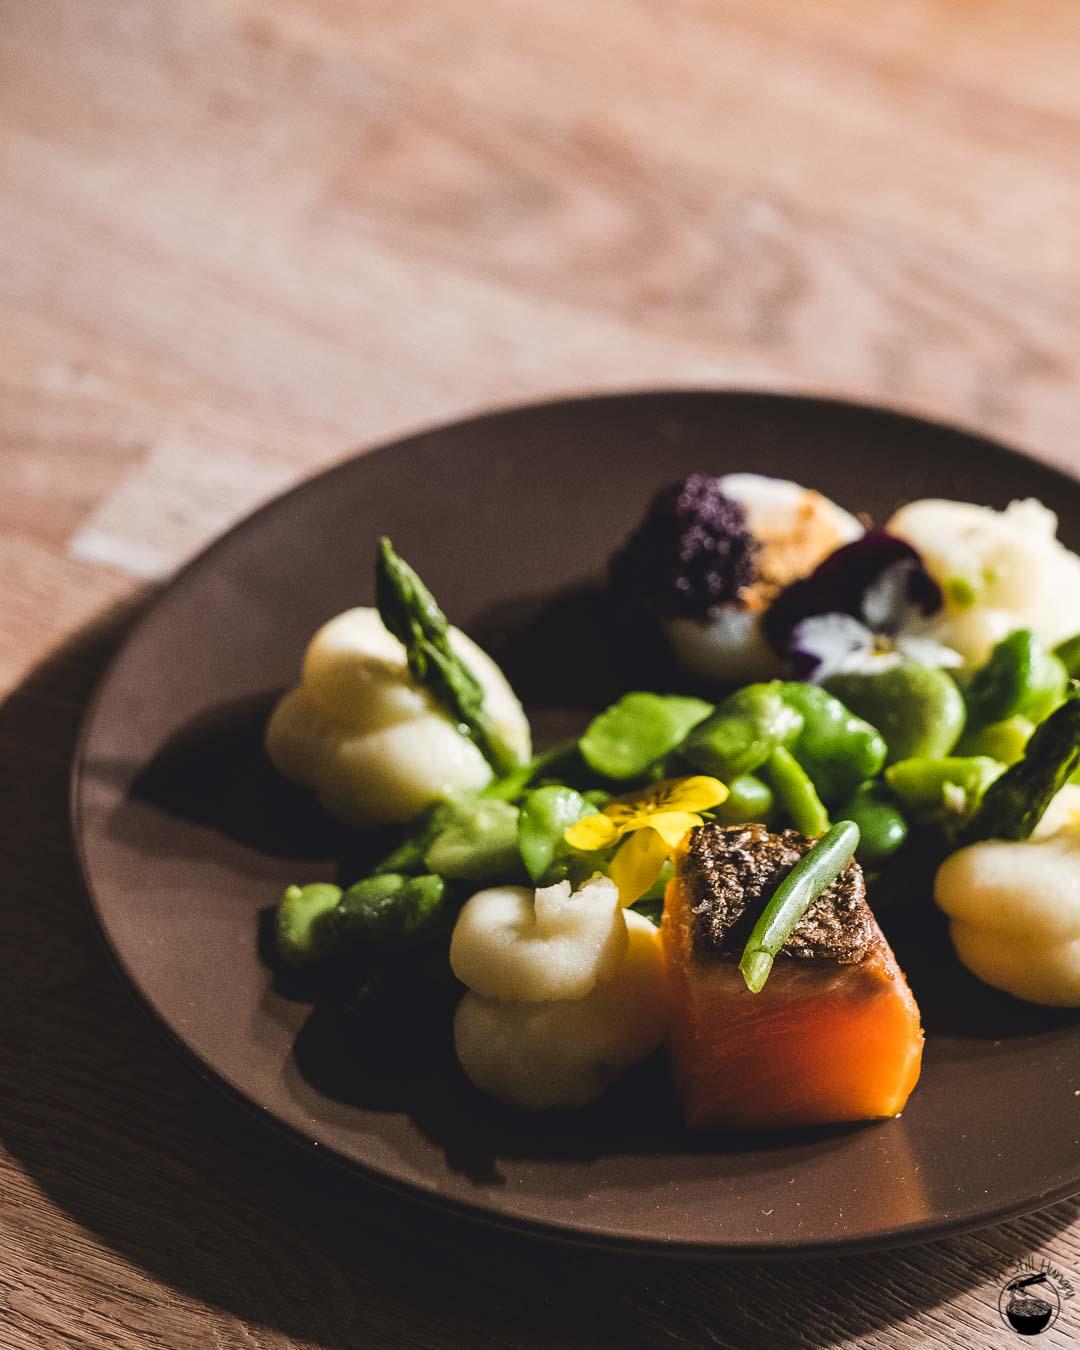 Blue Wren Restaurant Crispy skinned salmon, Himalayan salt rock seared scallop, potato puree, broad beans, asparagus, corn dust, caviar